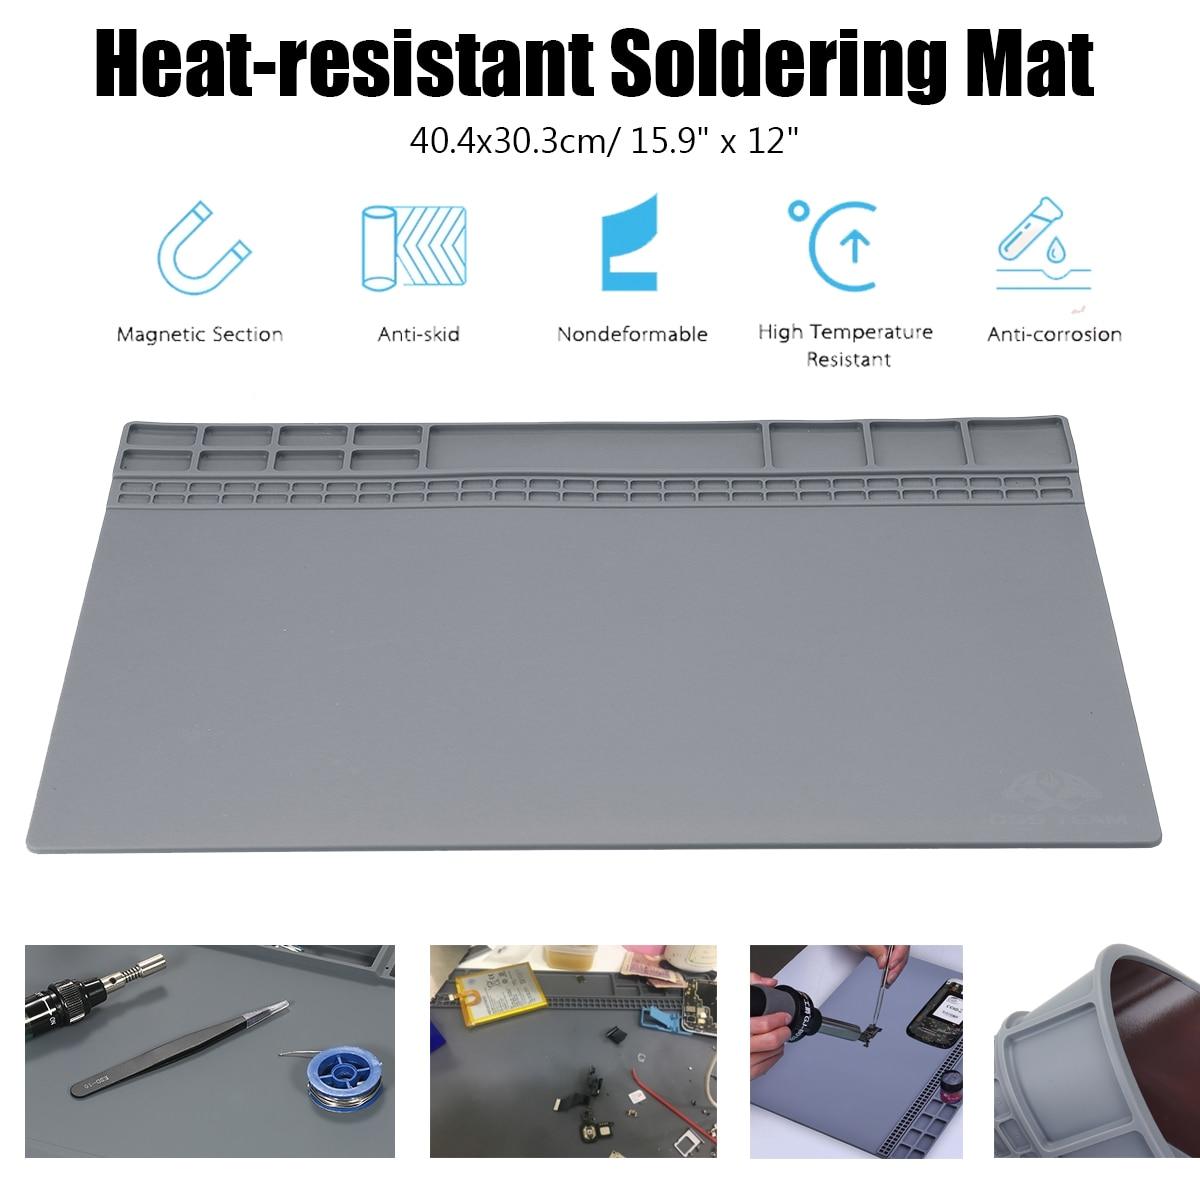 Insulation Pad Heat Resistant Soldering Station Silicon Soldering Mat Work Pad Desk Platform Soldering Repair Station